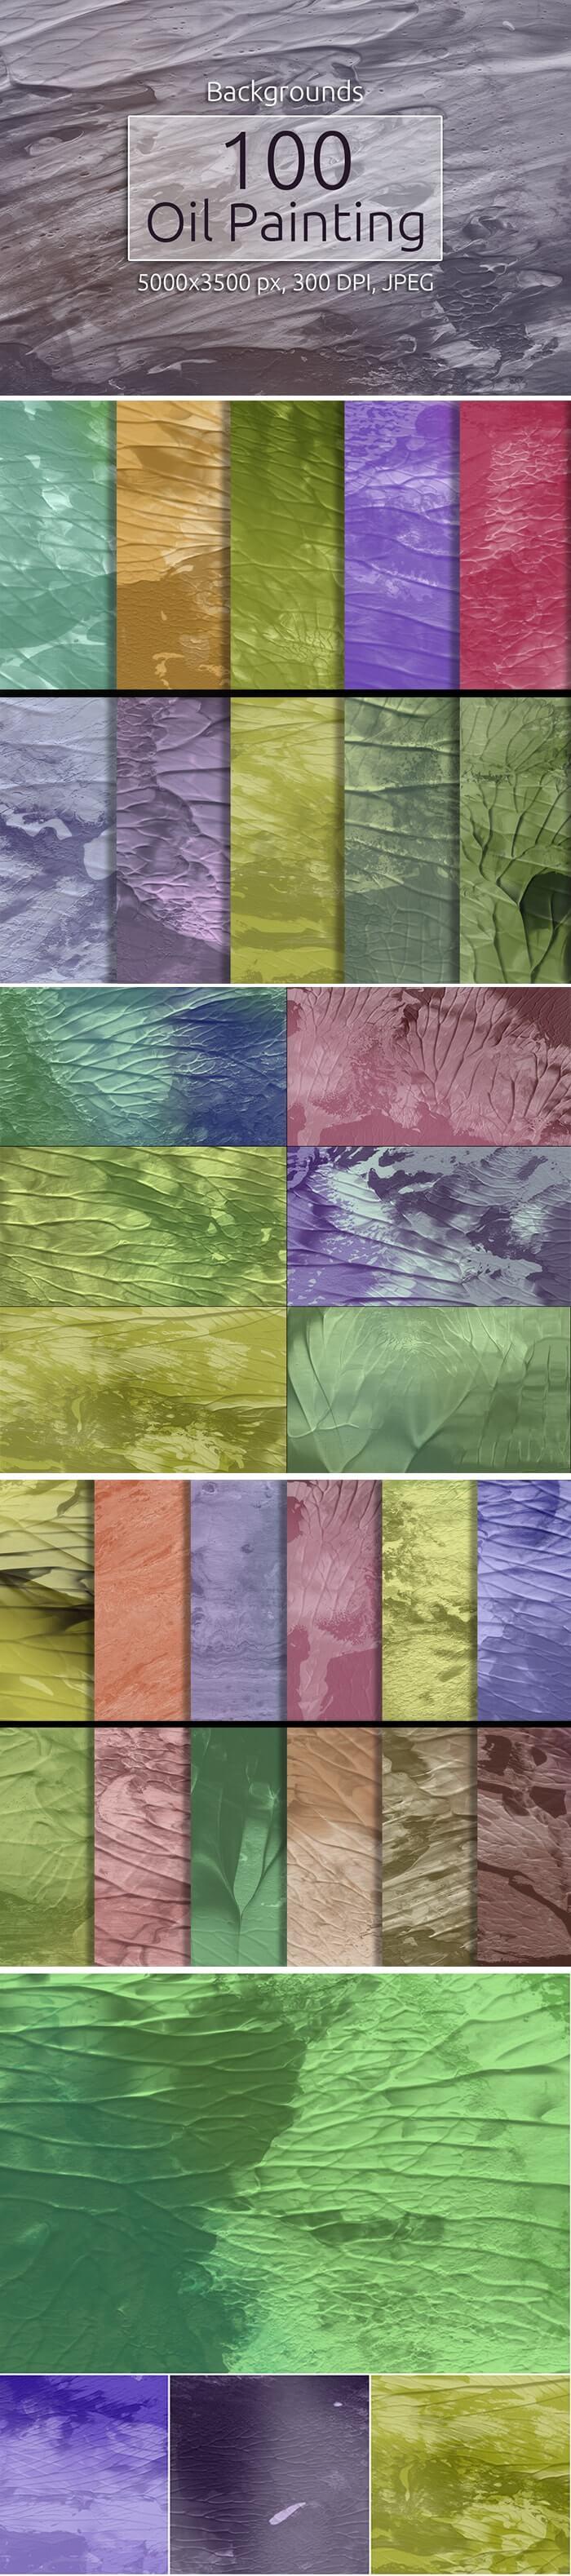 2000+ High Resolution Digital Backgrounds Bundle - $29 - 100 Oil Painting Backgrounds